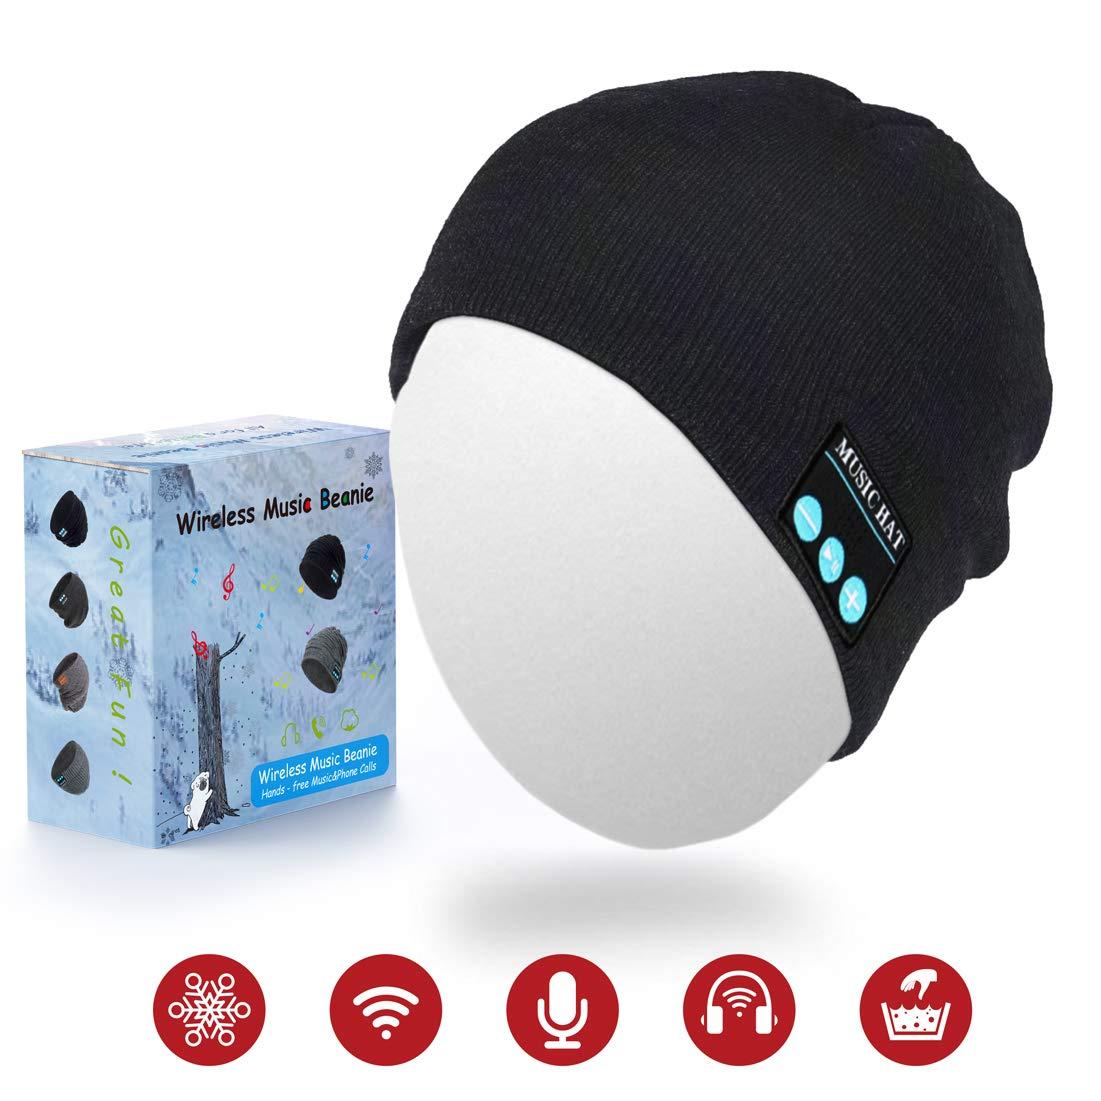 0daef8770 Humenn Bluetooth Beanie Hat, Wireless Smart Headphone Premium Knit Cap with  Speaker & Mic, Unisex Headset Musical Cap for Outdoor Sports - Cool Beanie  ...